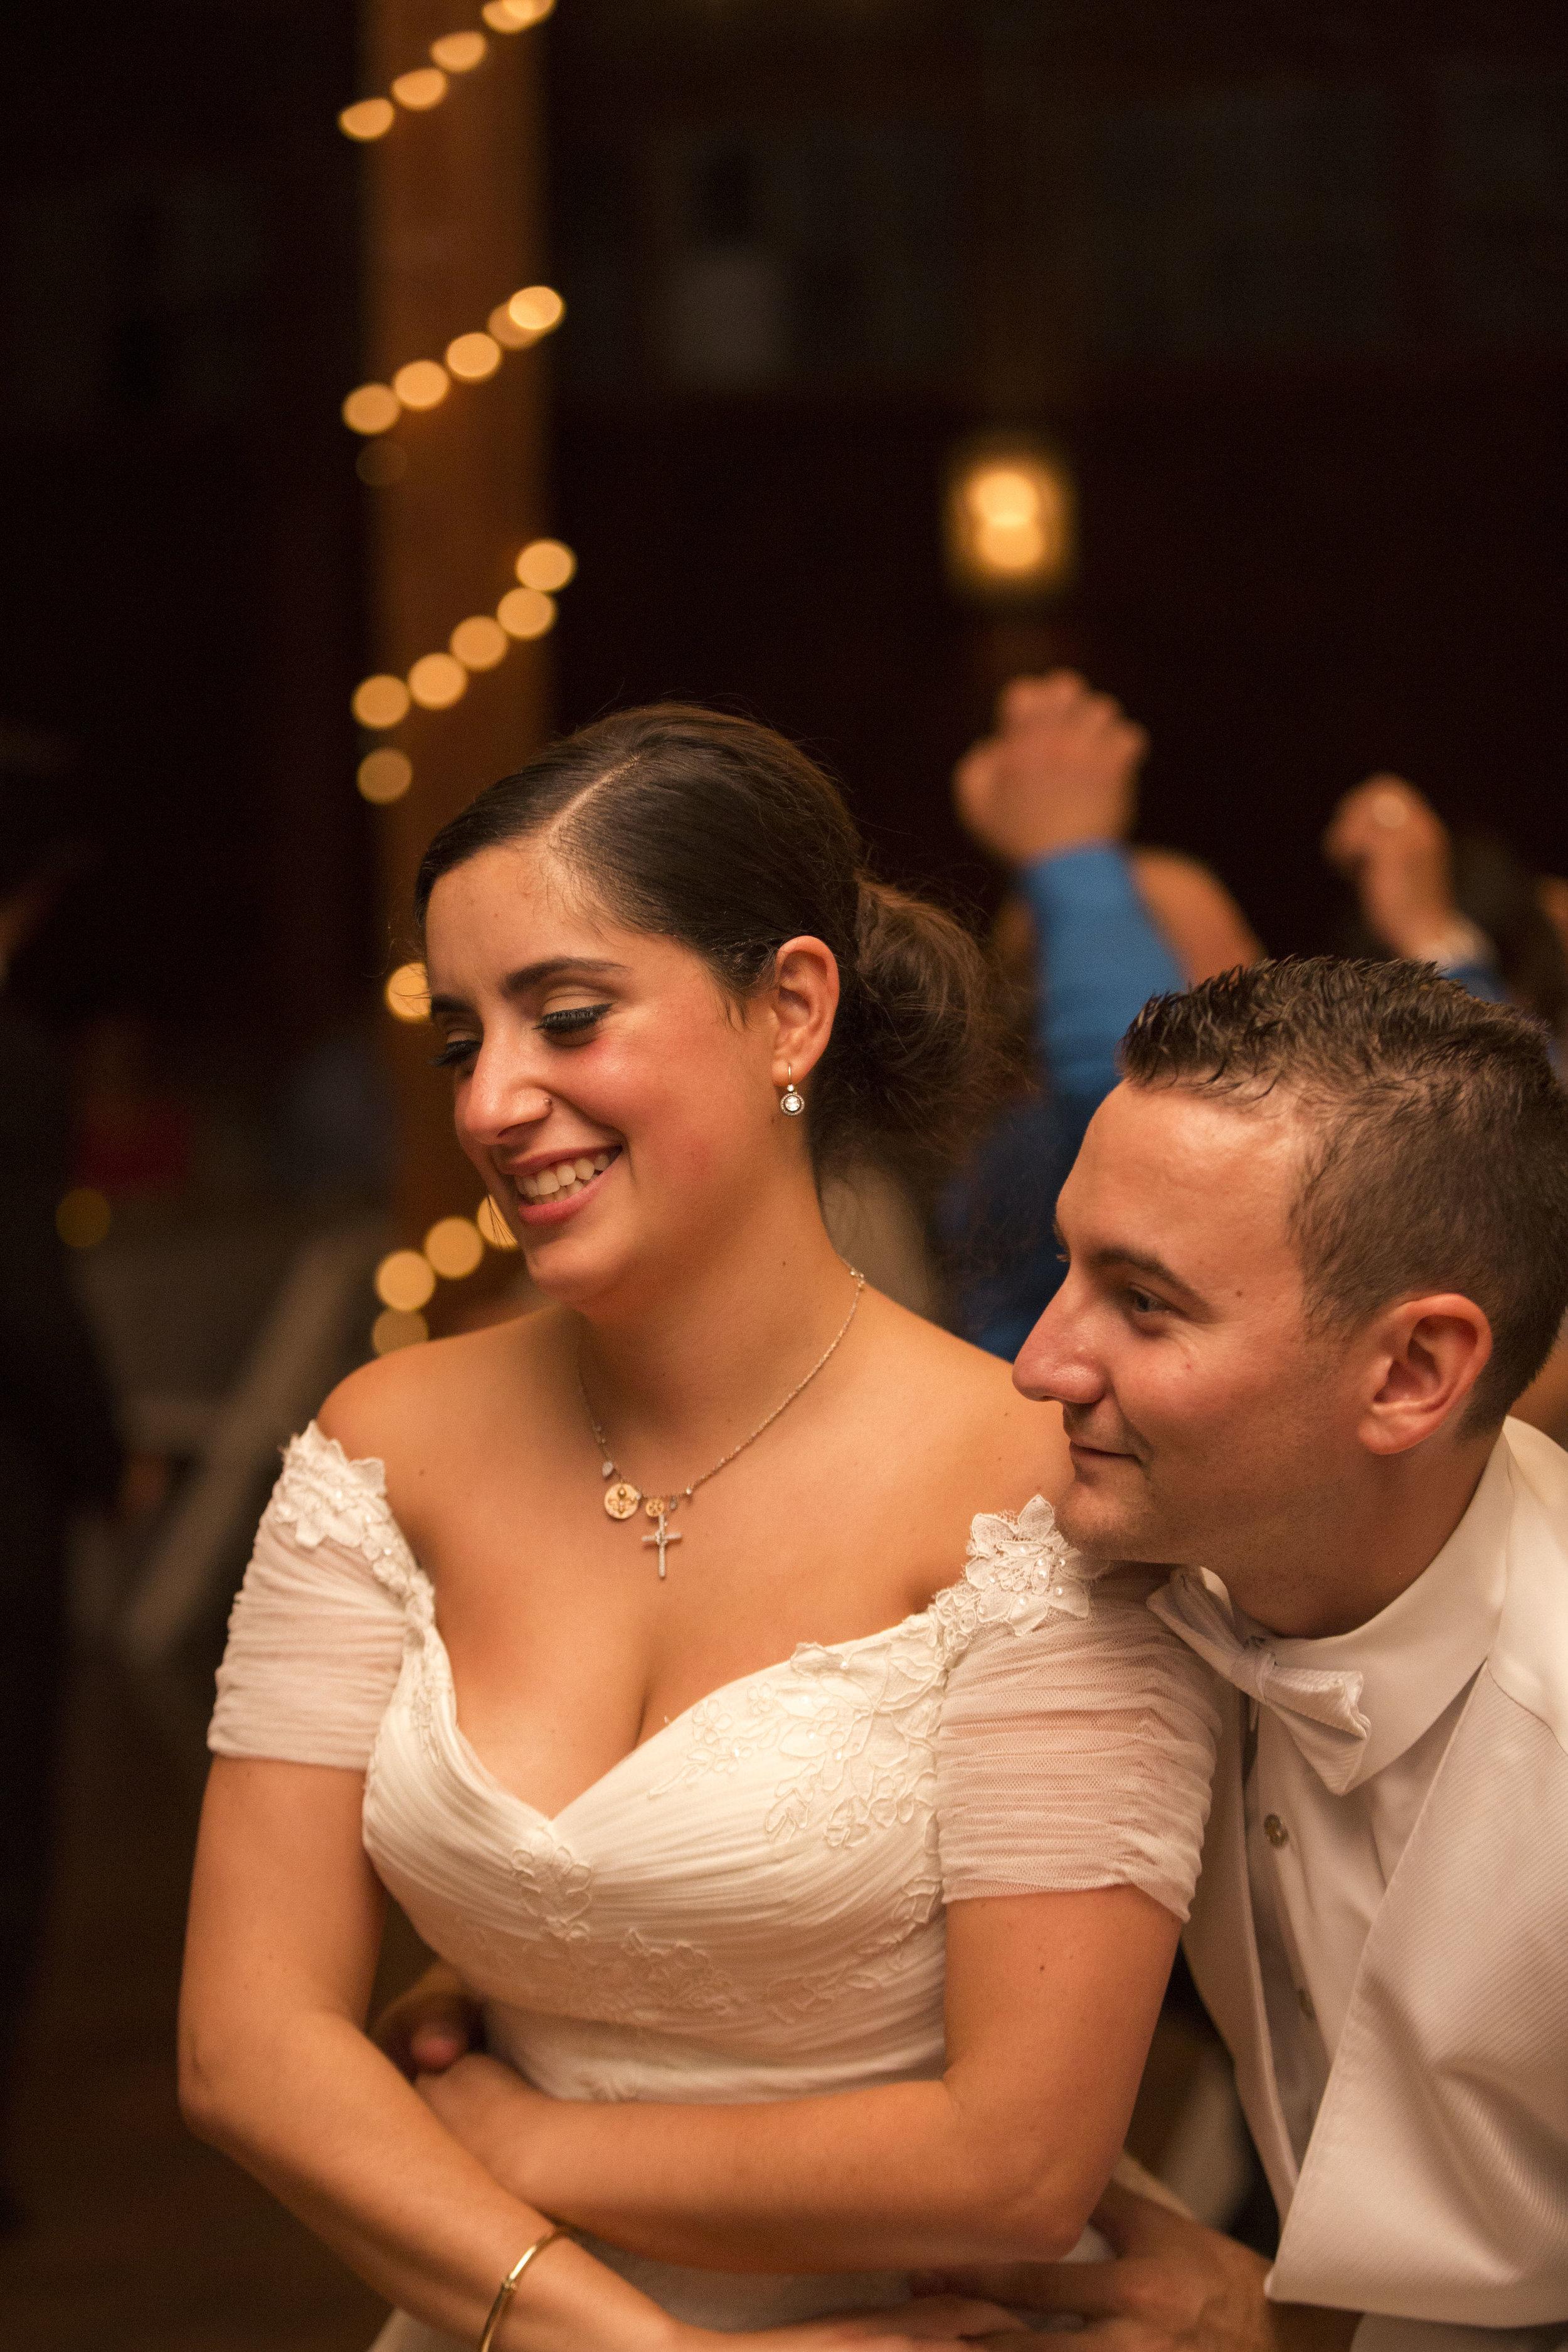 ATGI_Magali & Josh Wedding1_2S8A2692.jpg